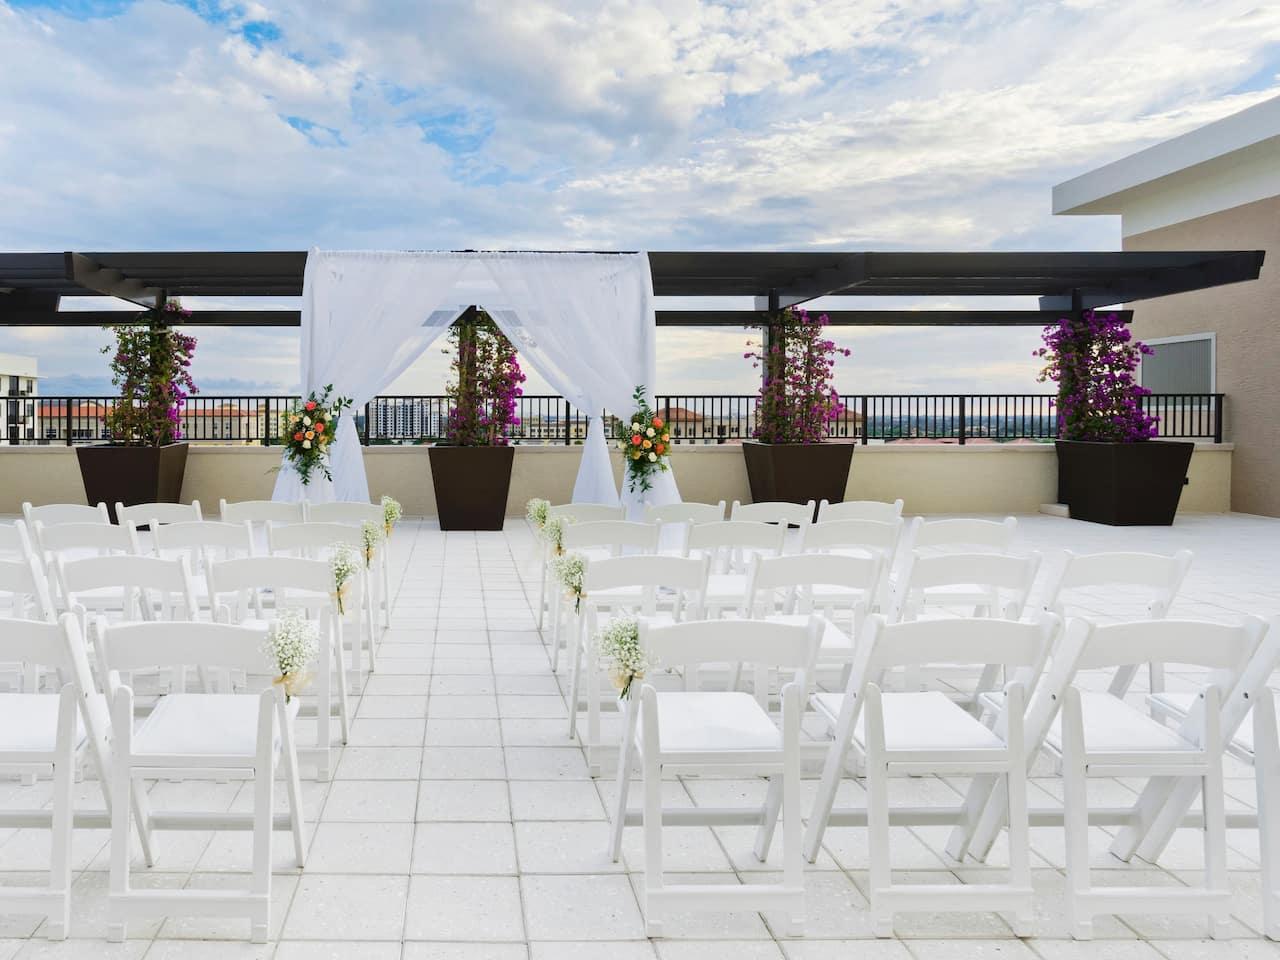 Outdoor Rooftop Wedding at Hyatt Place Boca Raton/Downtown